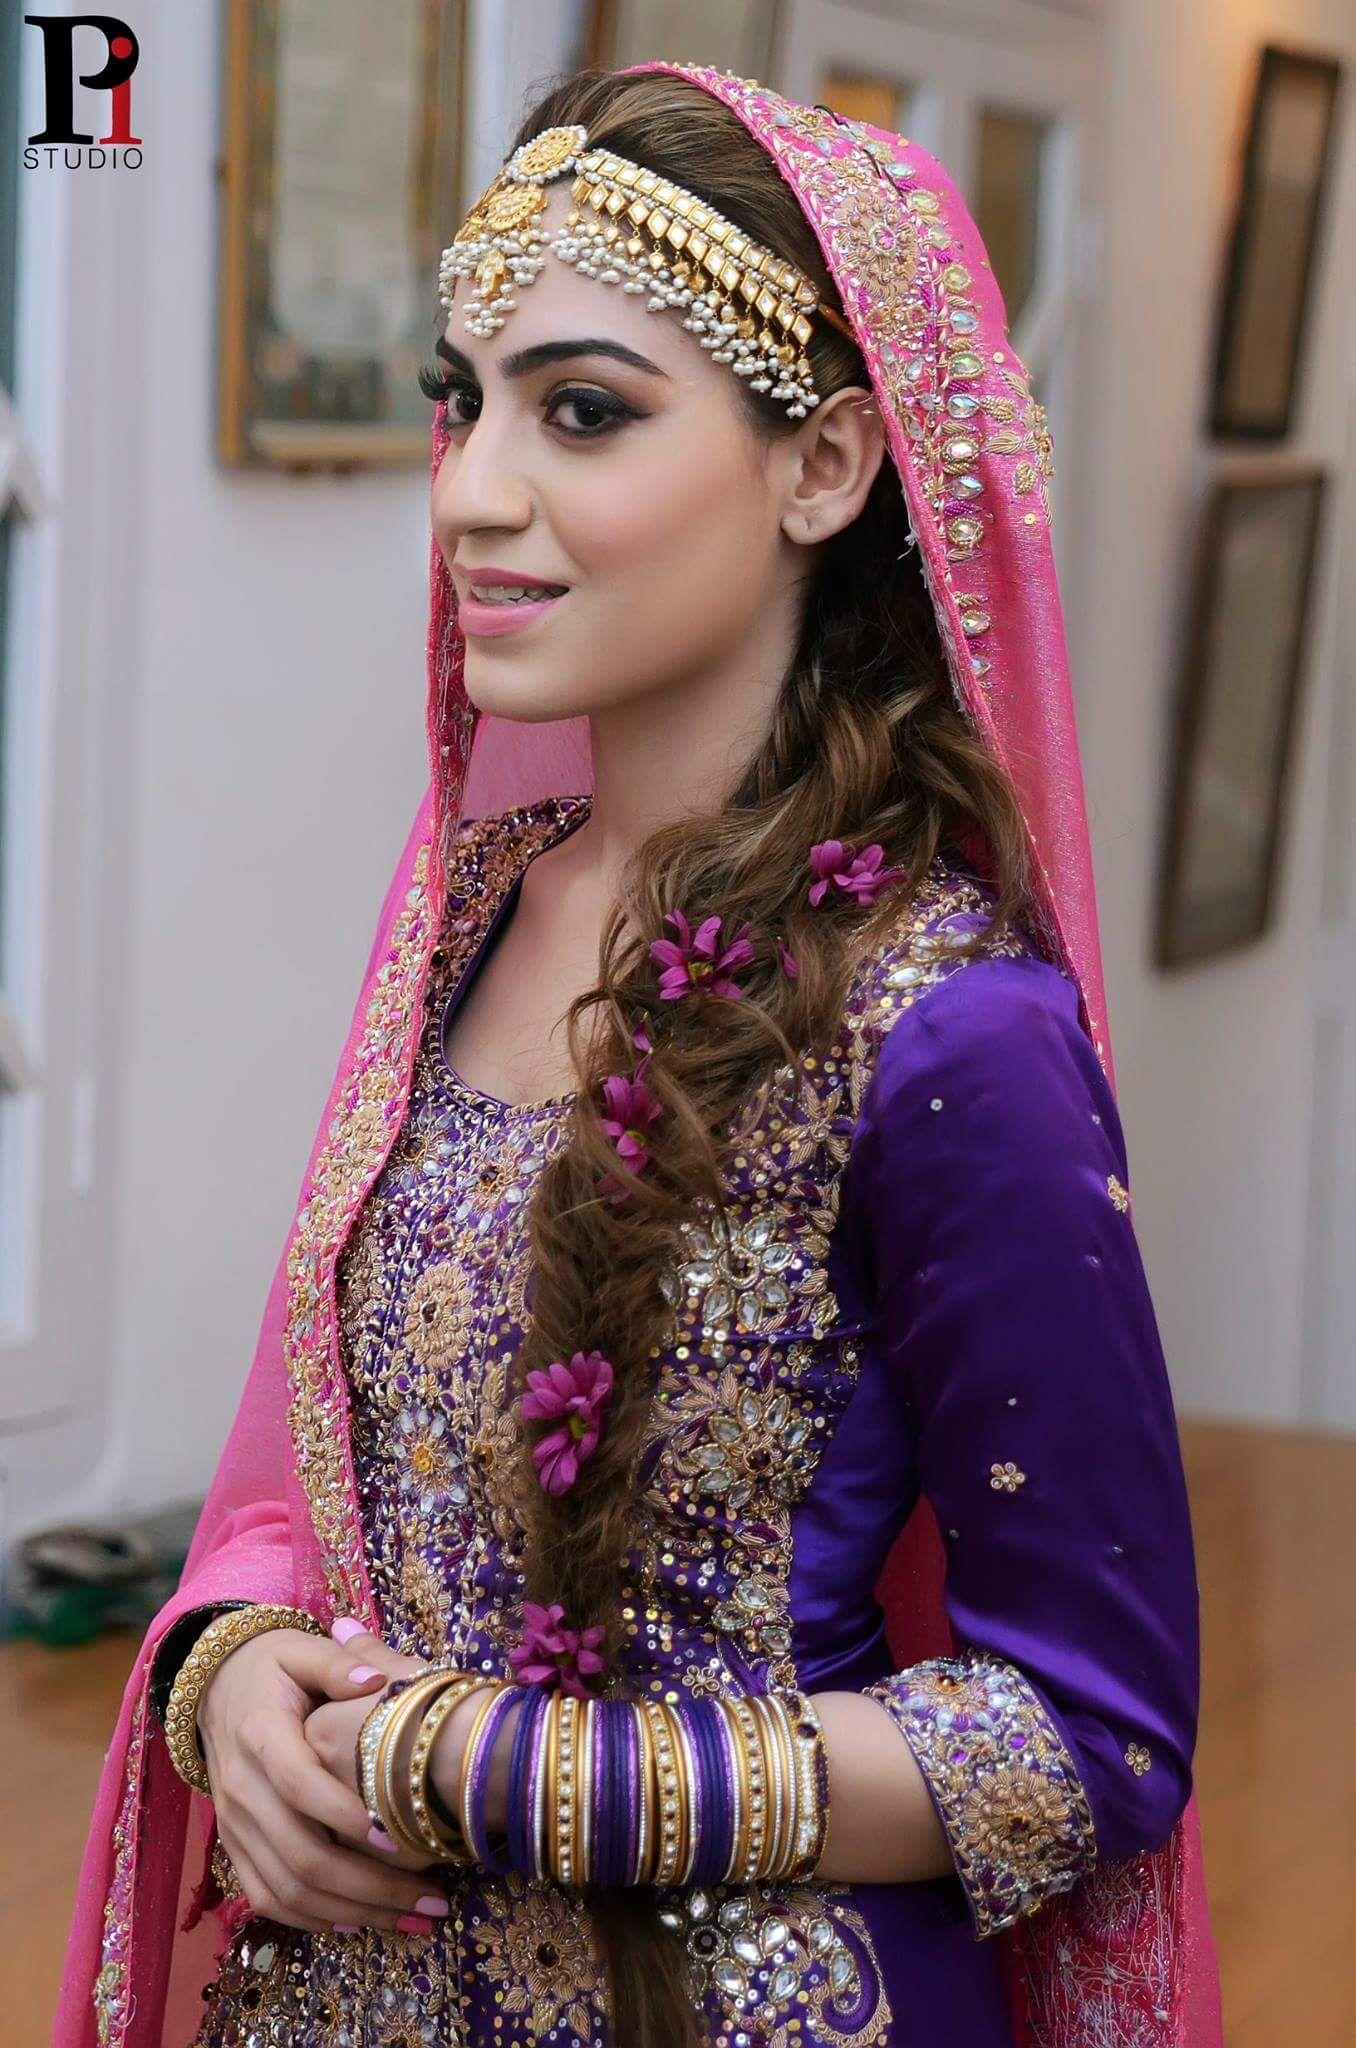 best images about mehndi designs henna mehndi 17 best images about mehndi designs henna mehndi mehendi and heena design